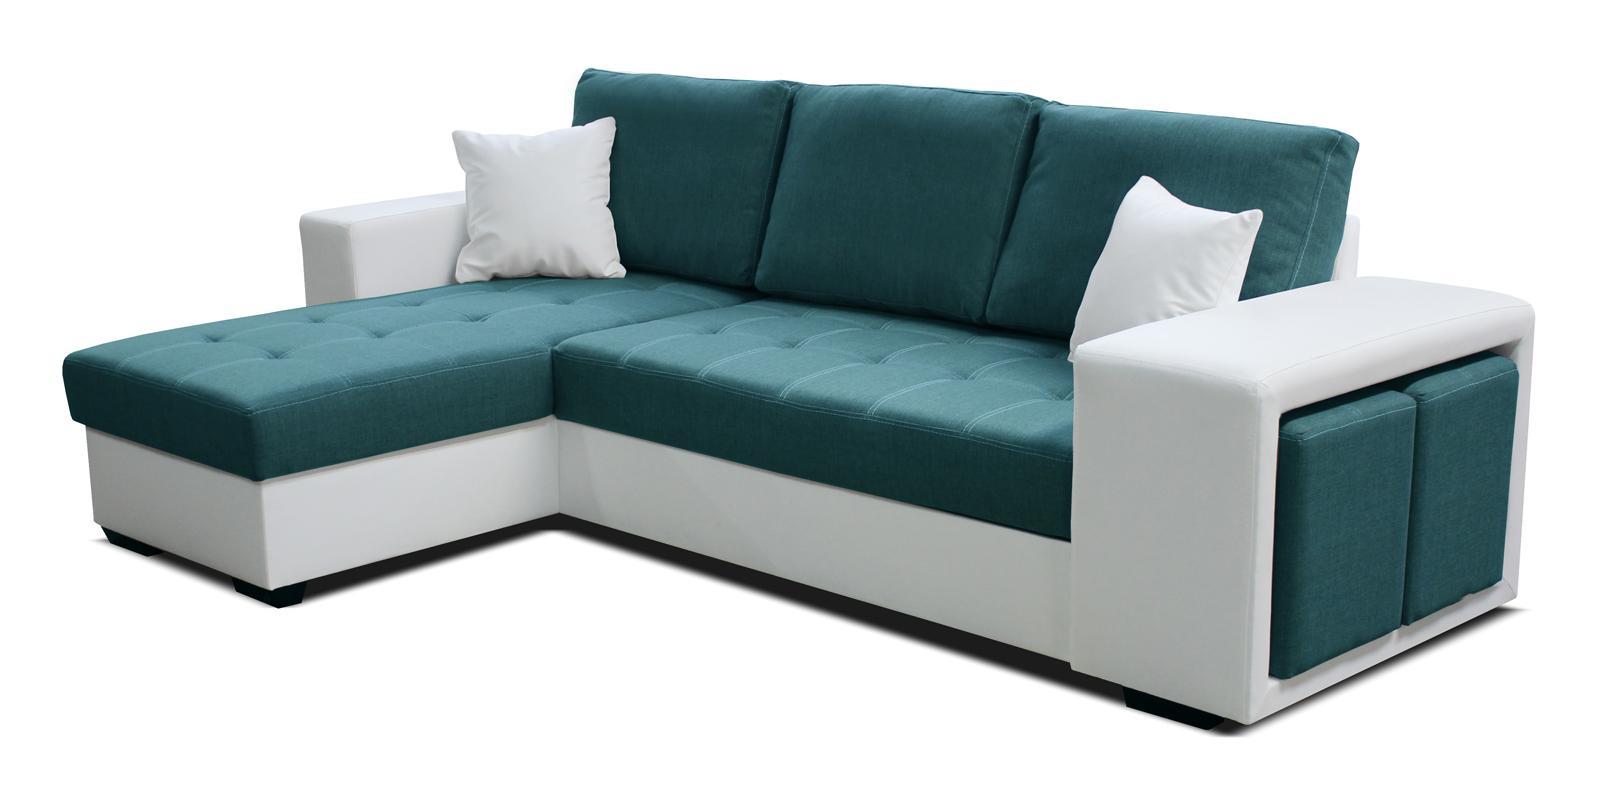 Rohová sedačka Thema Lux L+2F (tyrkysová + biela) (L)